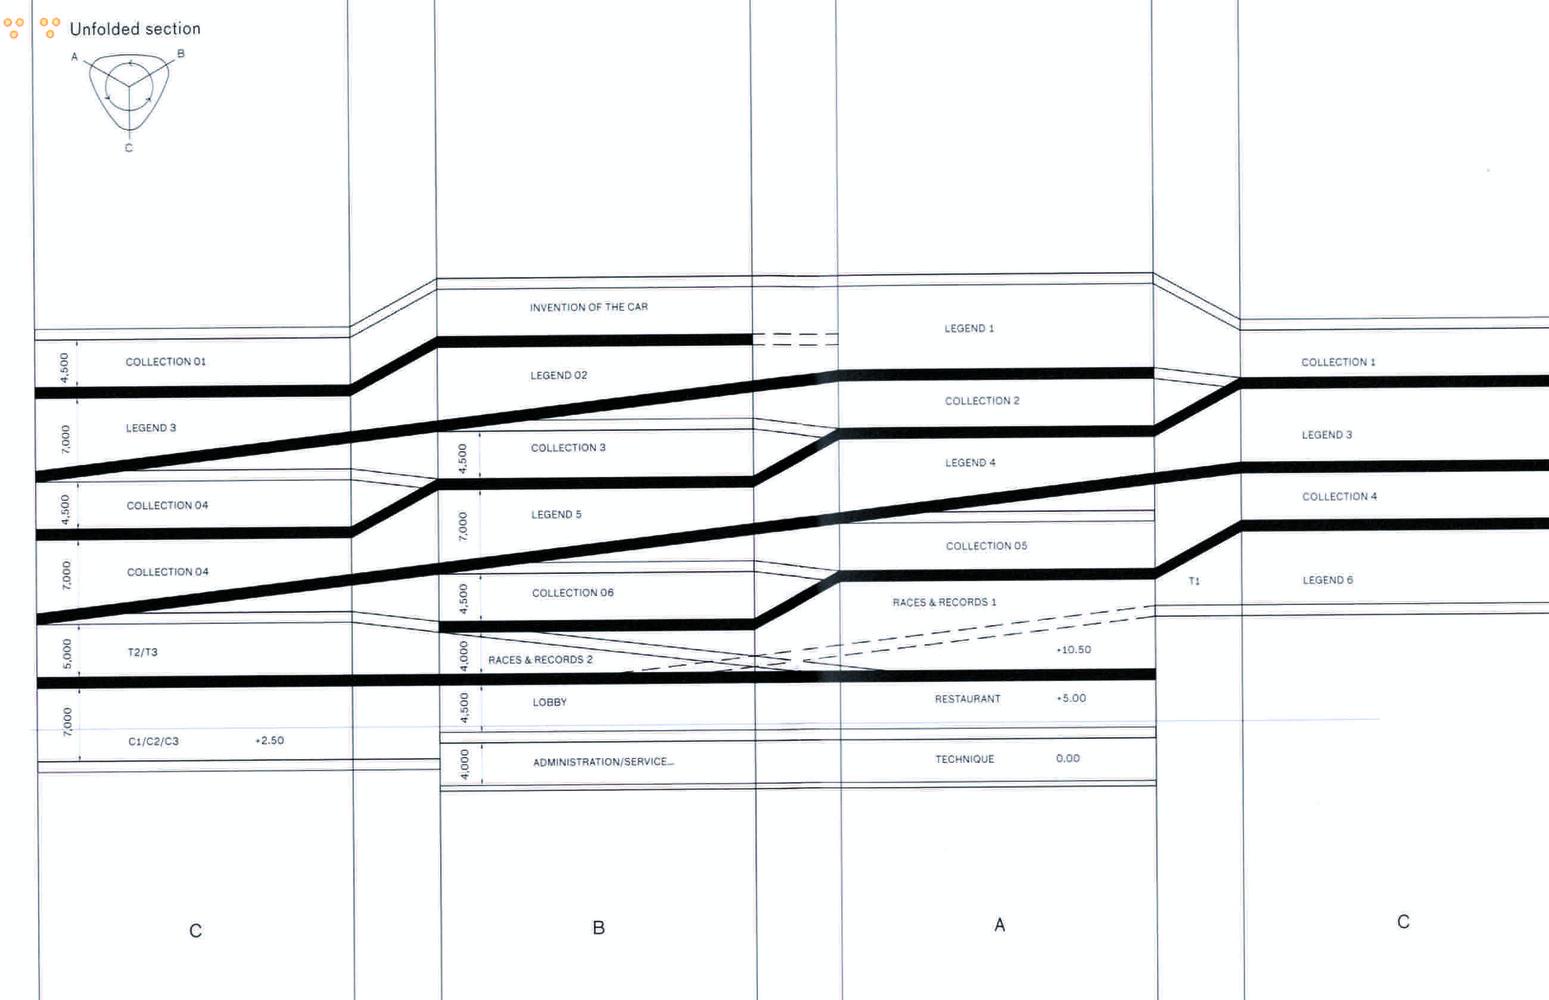 hight resolution of gallery of mercedes benz museum unstudio 23 1972 mercedes benz wiring diagrams mercedes benz diagram